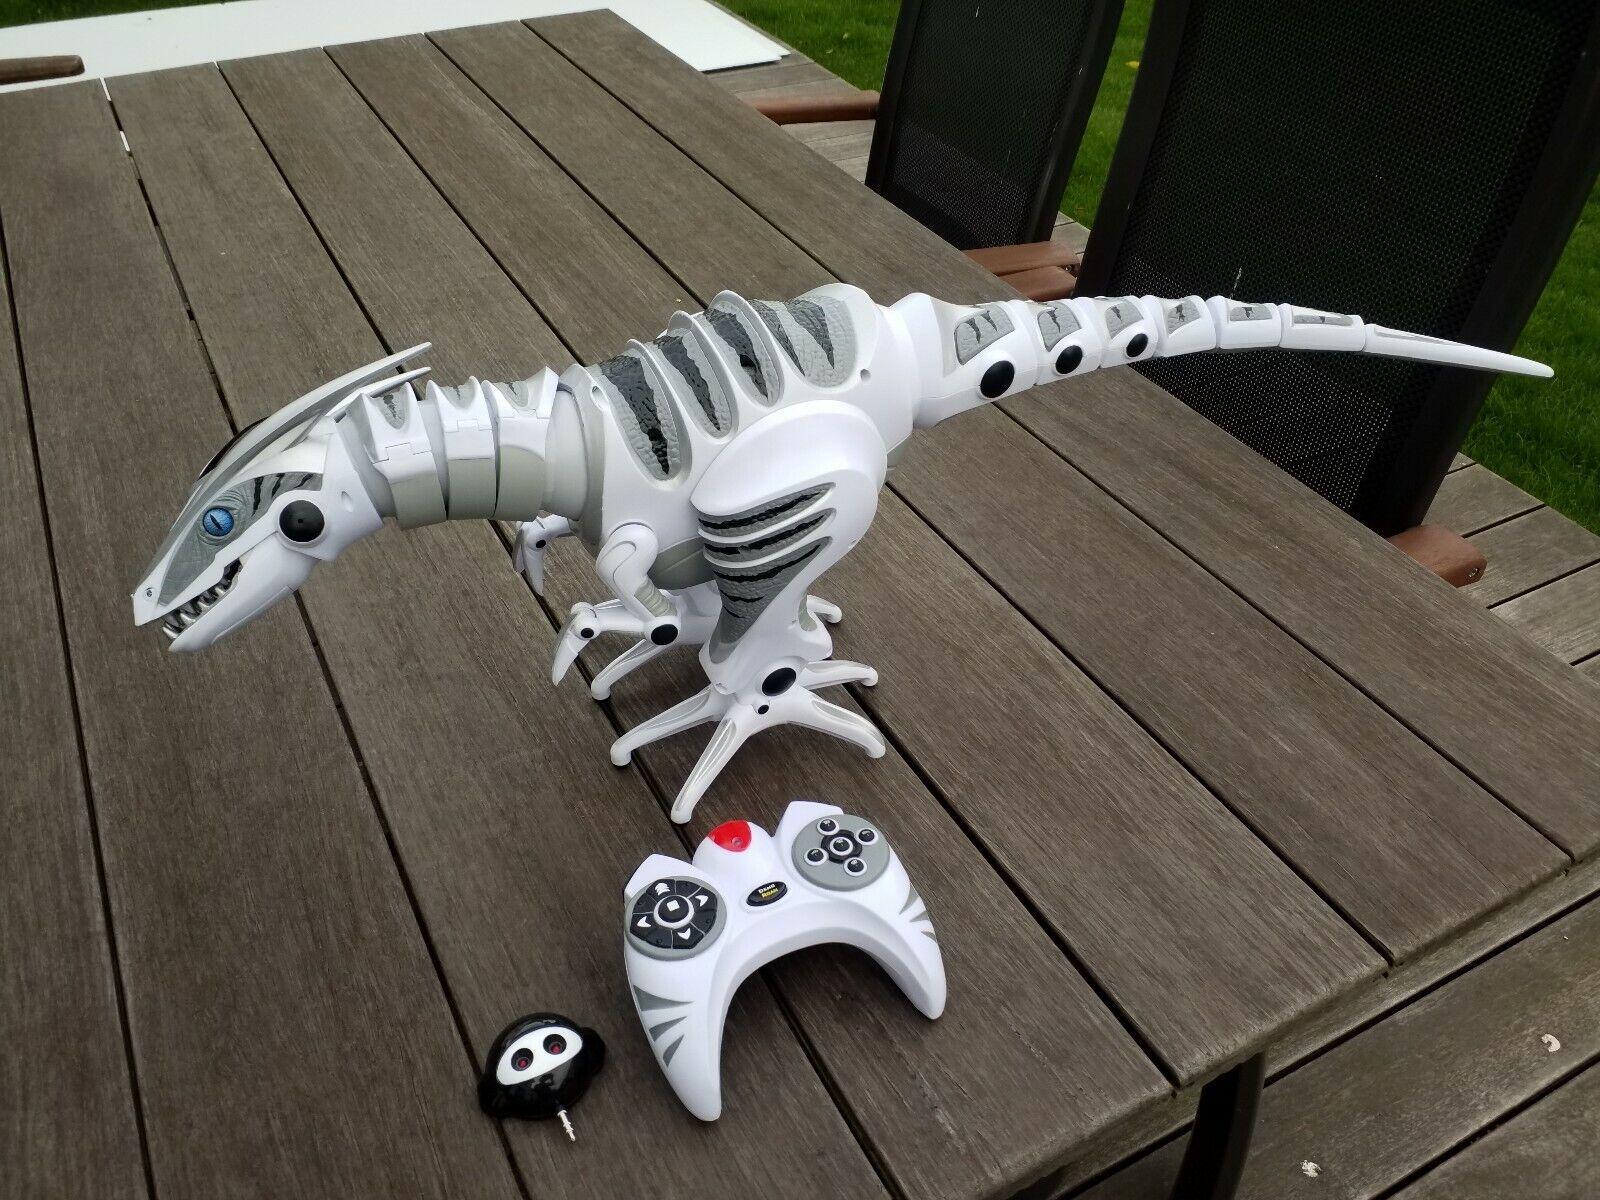 Wowwee Roboraptor X mit Smartphone Dongle, 80 cm